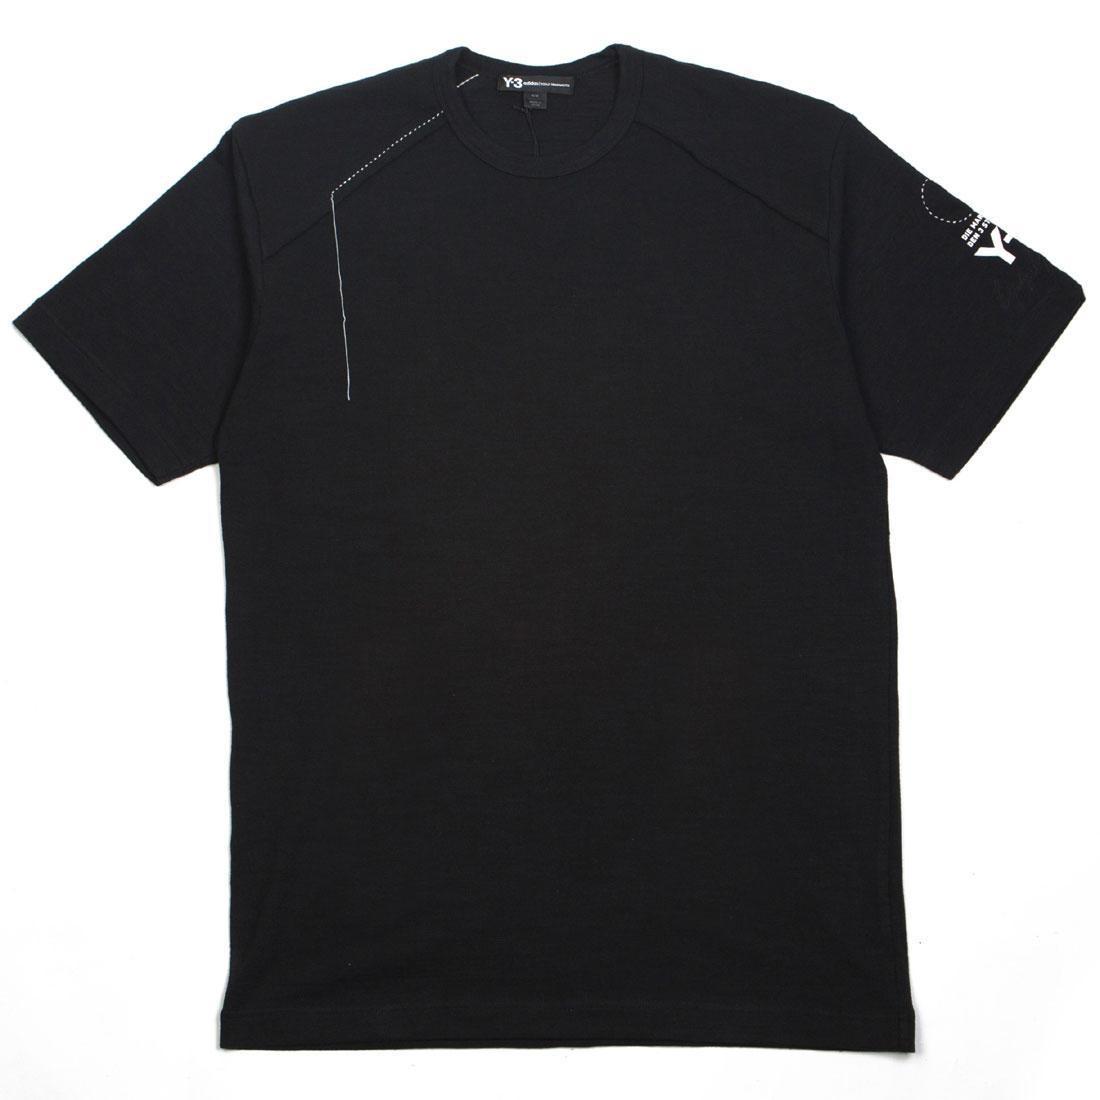 Adidas Y-3 Men Sashiko Short Sleeve Tee (black / champagne)